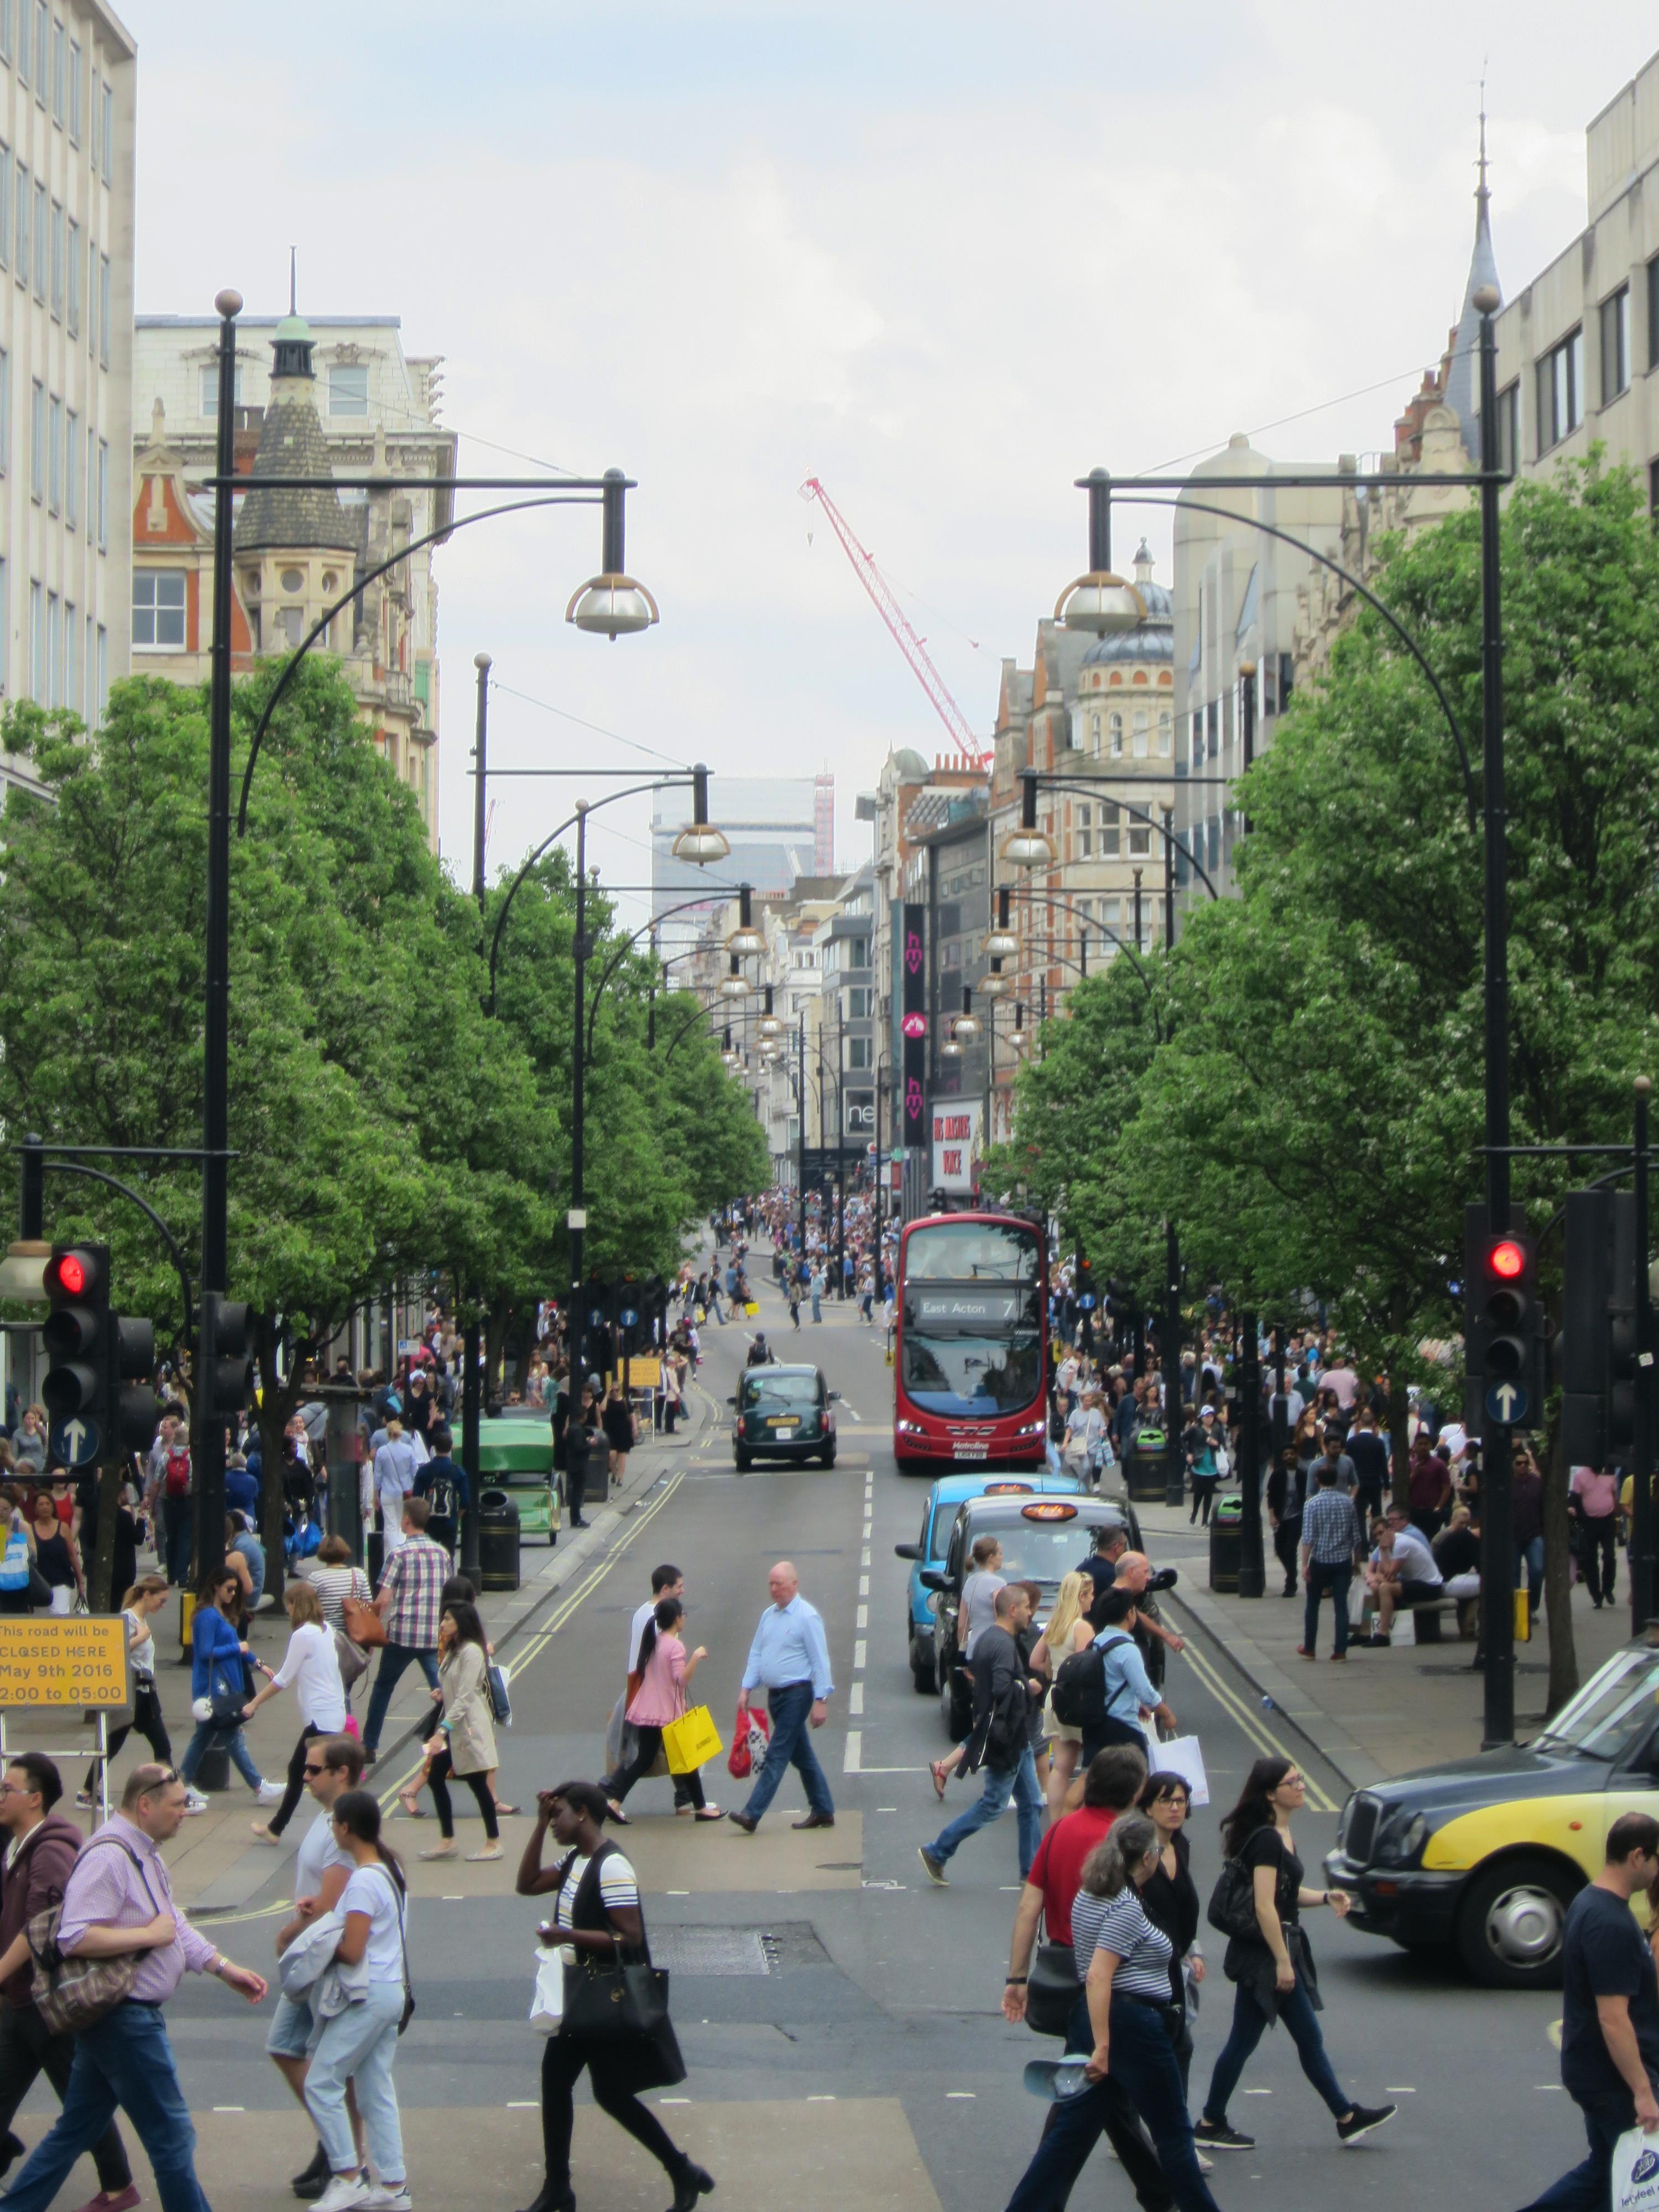 Oxford Street - Wikipedia